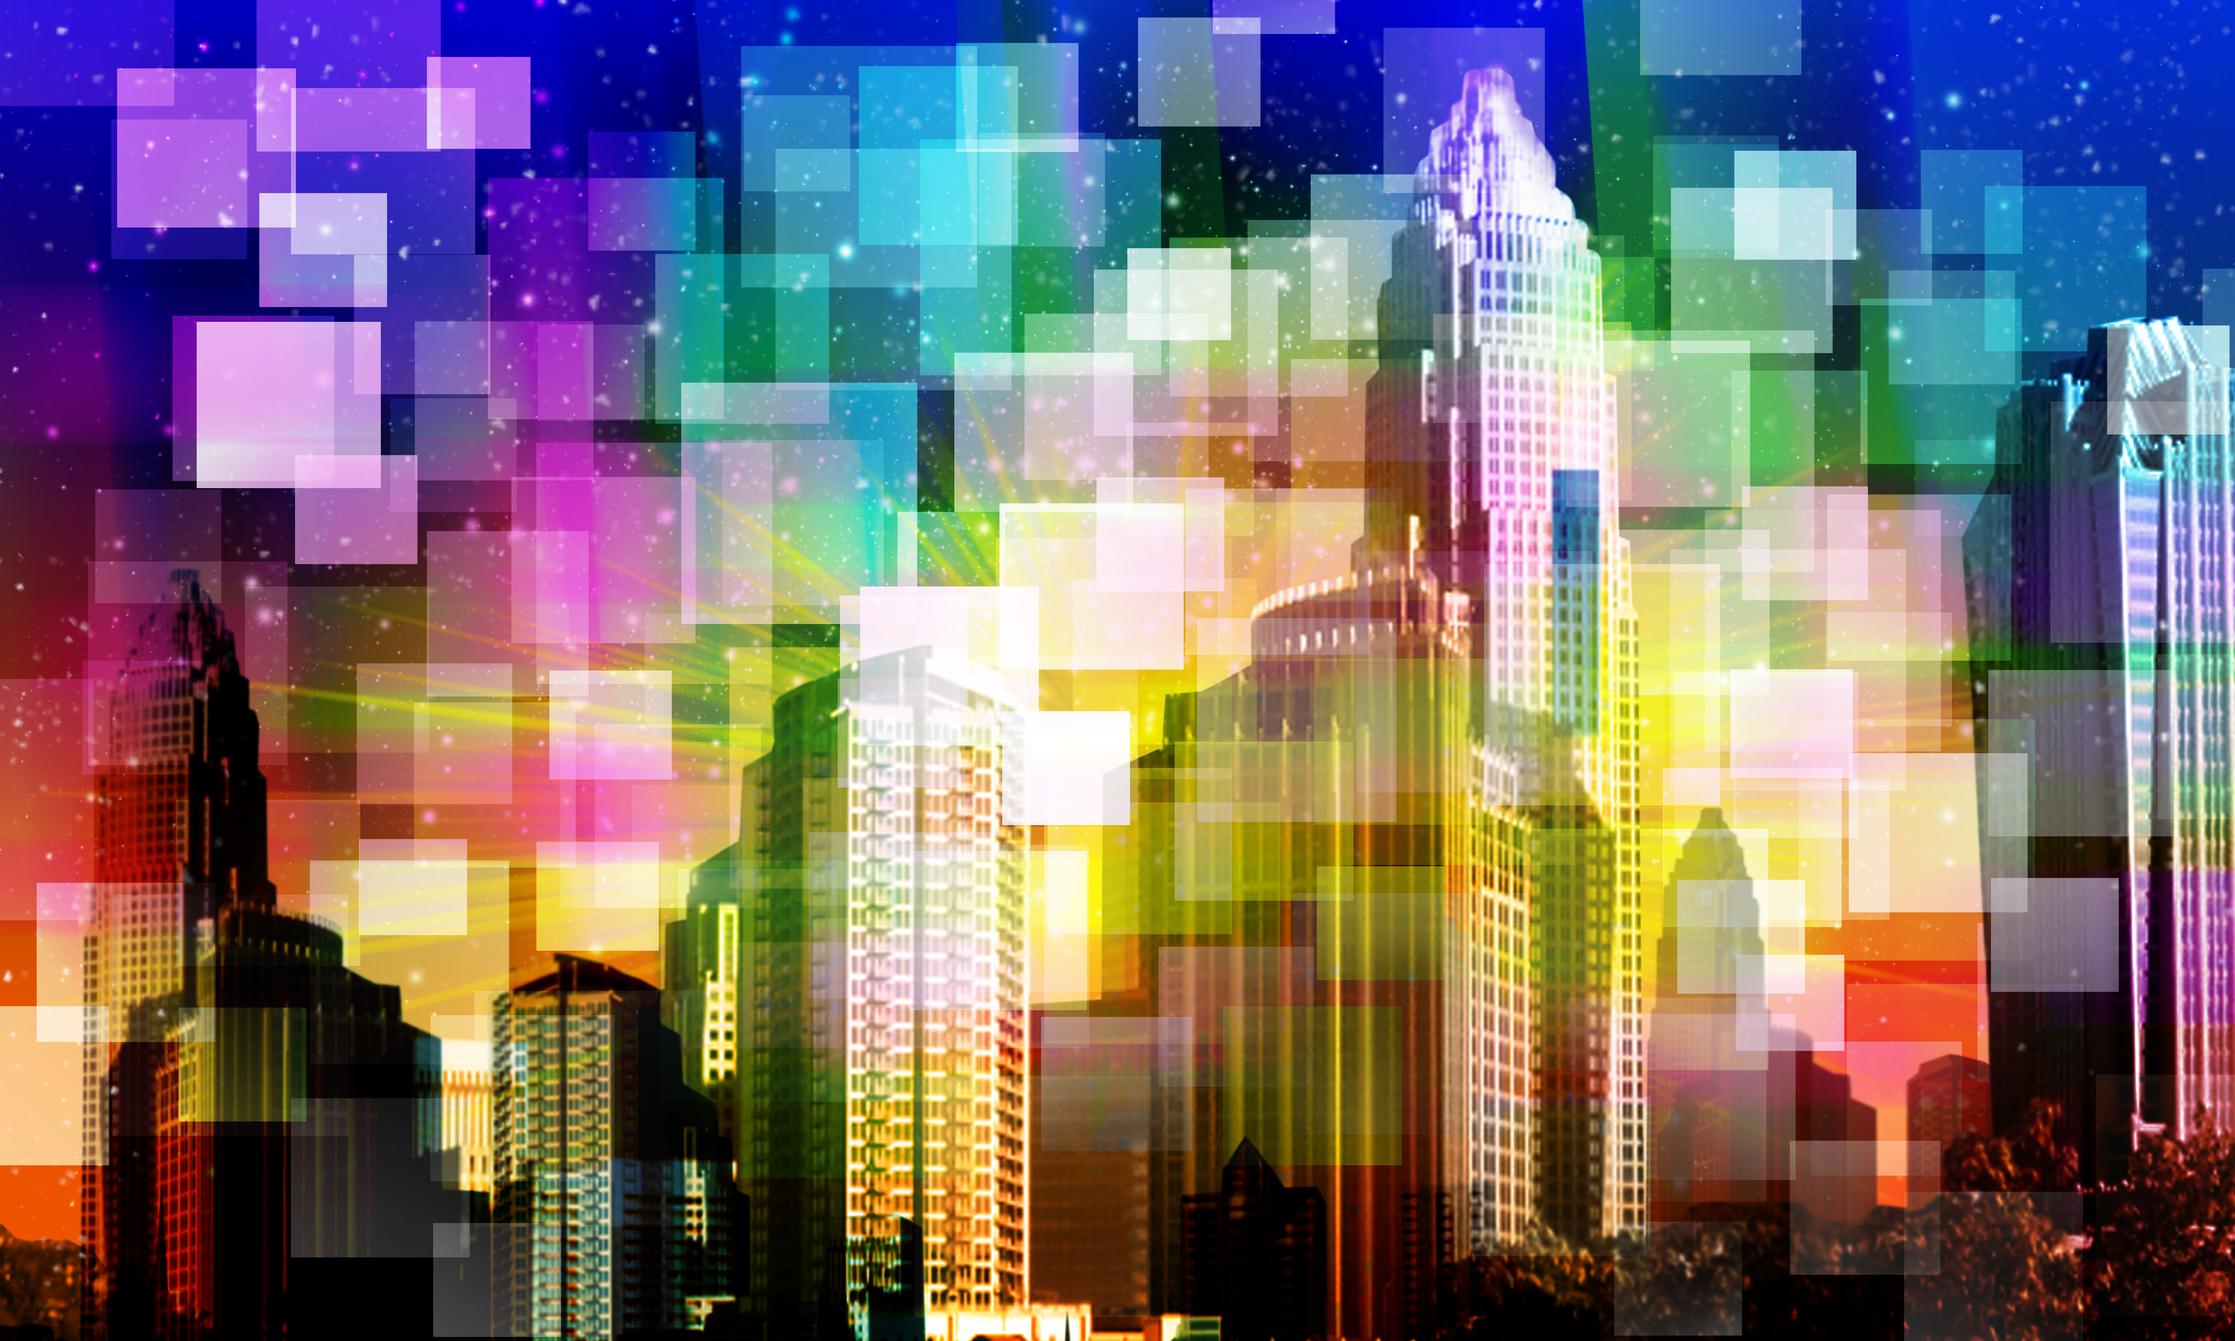 Art & Design, Architecture and Urban Planning